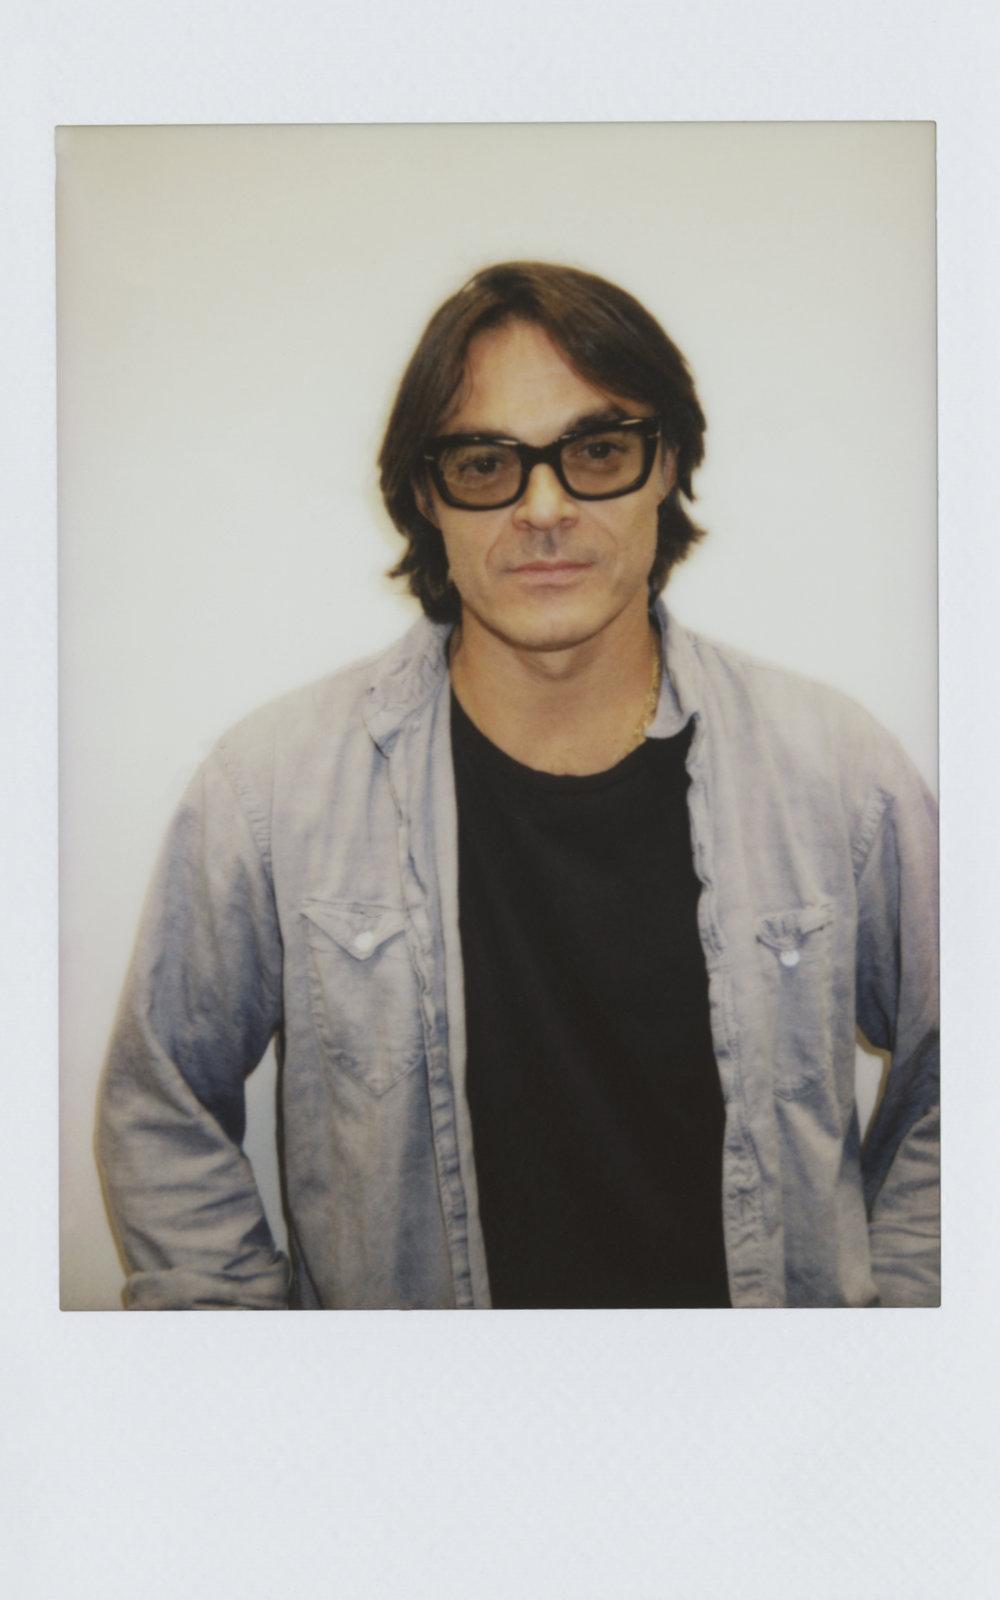 Mario Sorrenti, NYC 2017